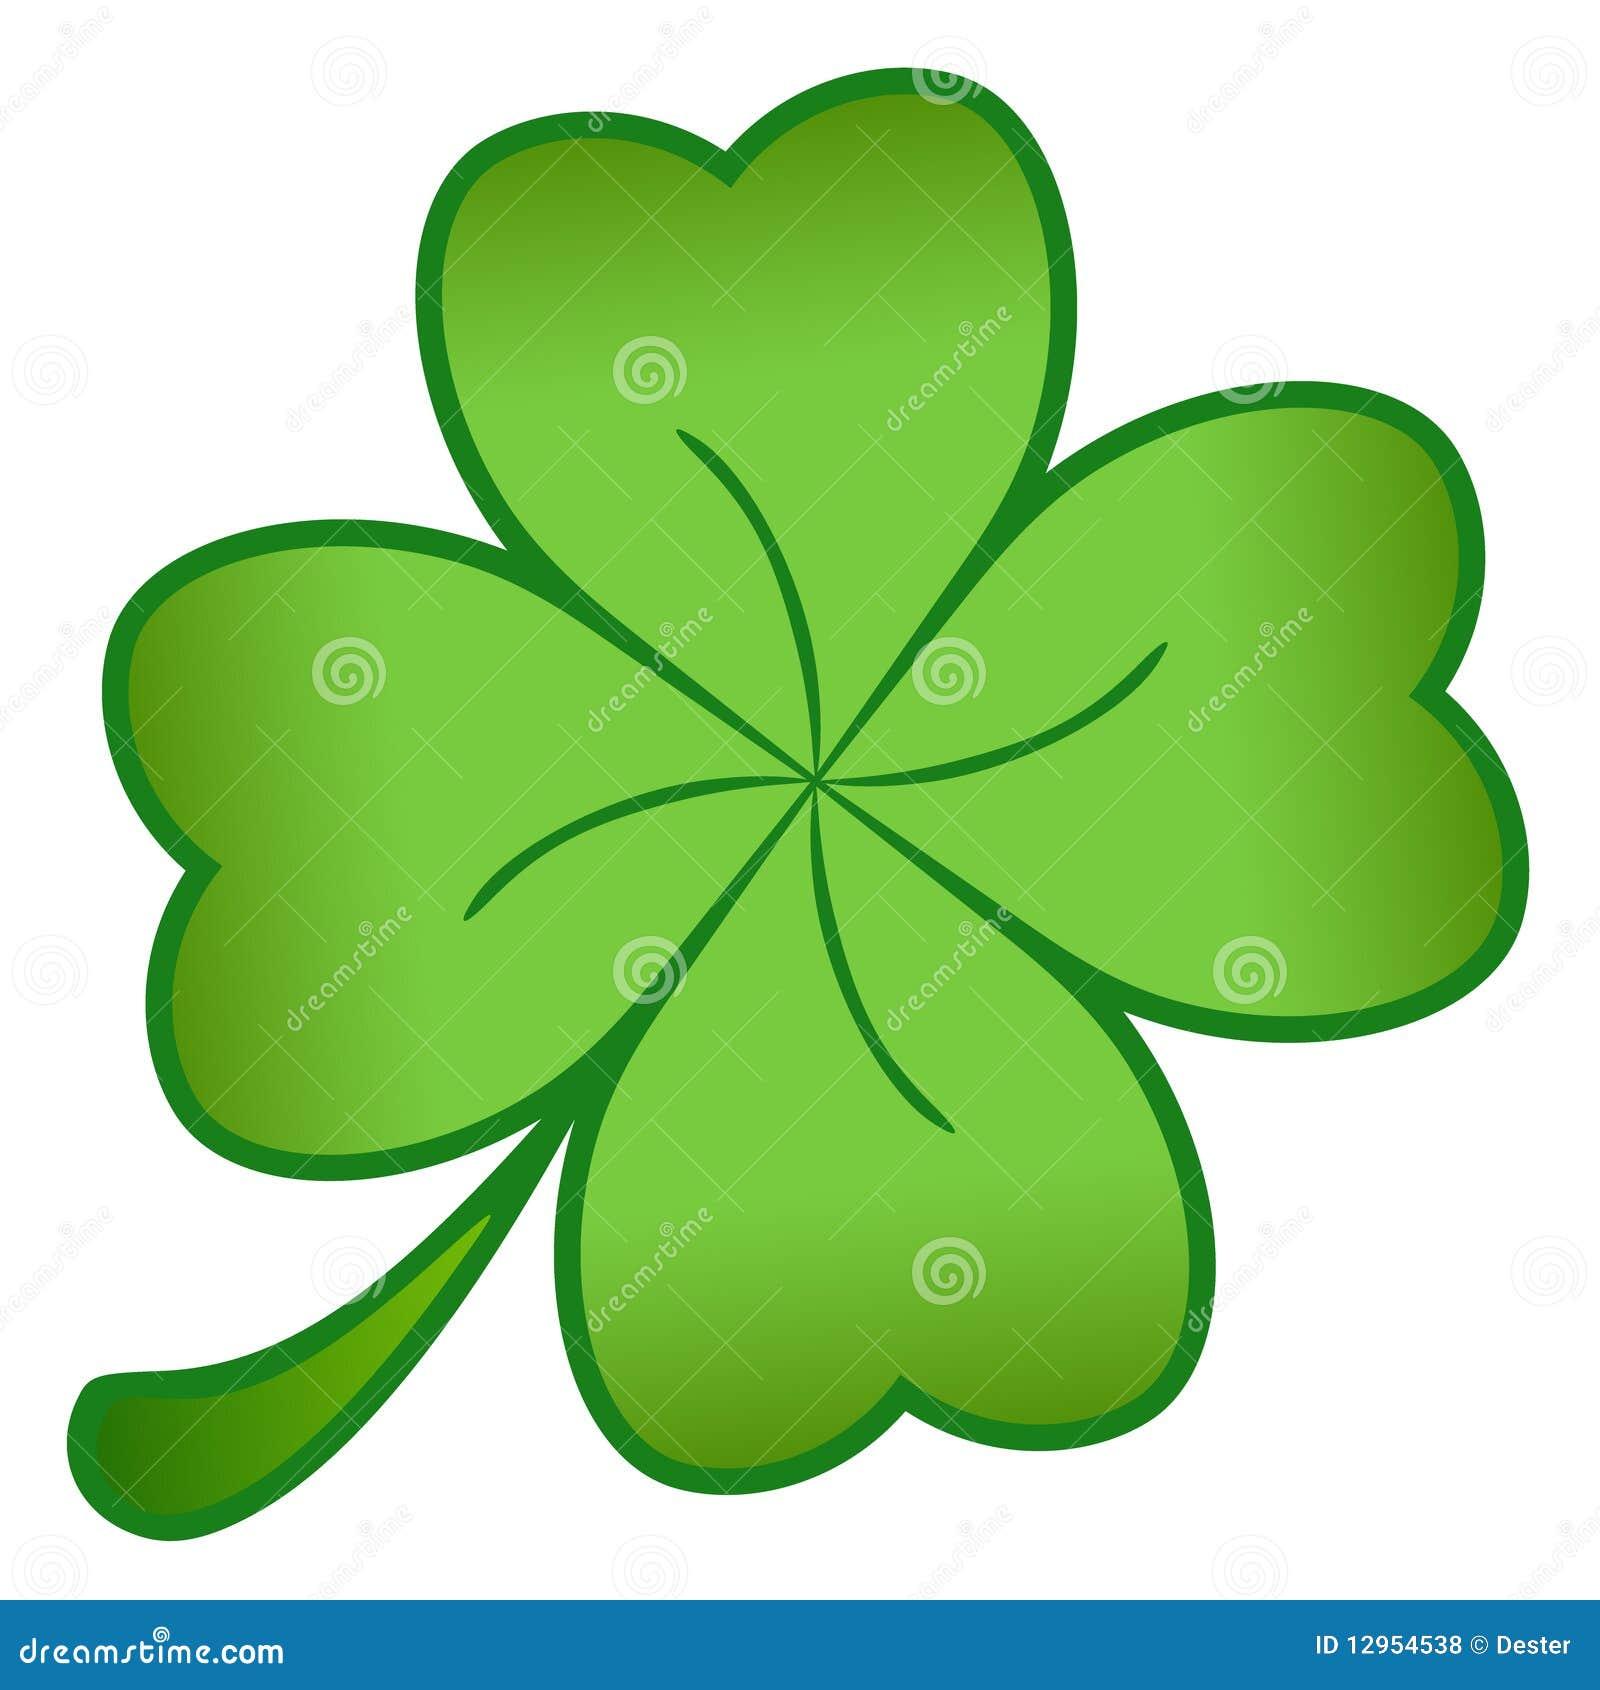 Green Cloverleaf Royalty Free Stock Photos - Image: 12954538